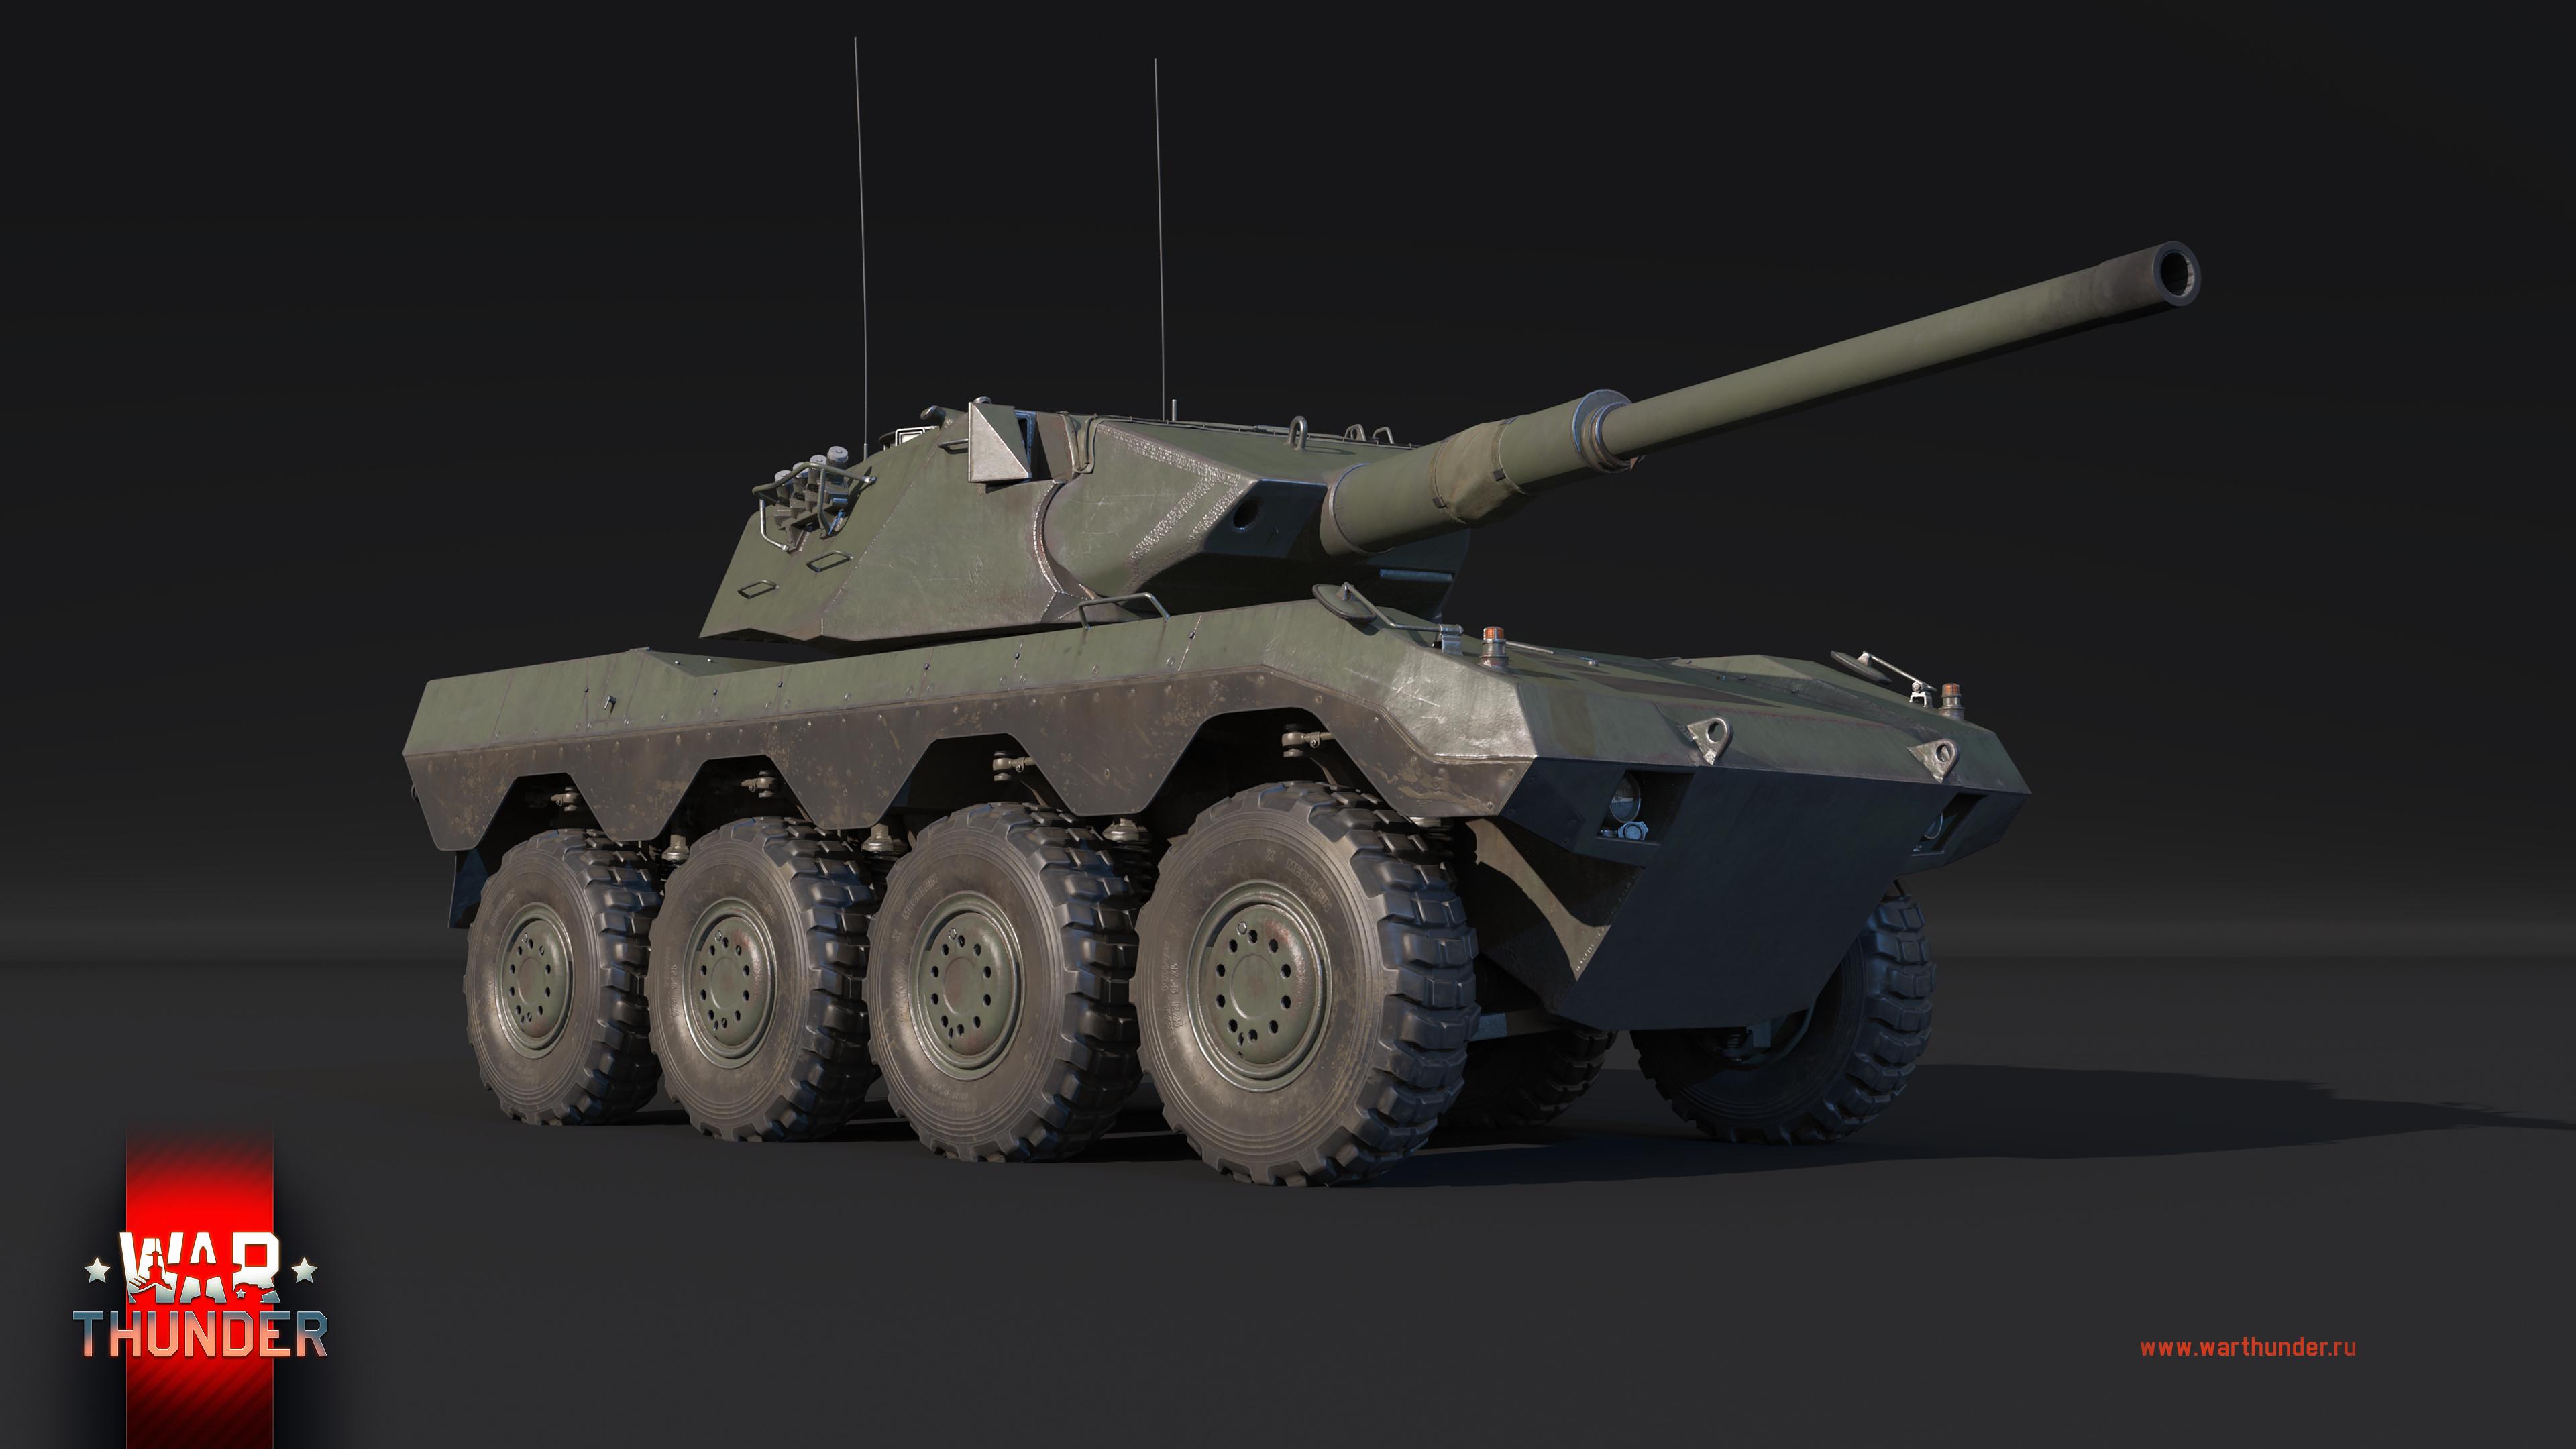 radpanzer_90_3840x2160_logo_ru_d748bf1c8